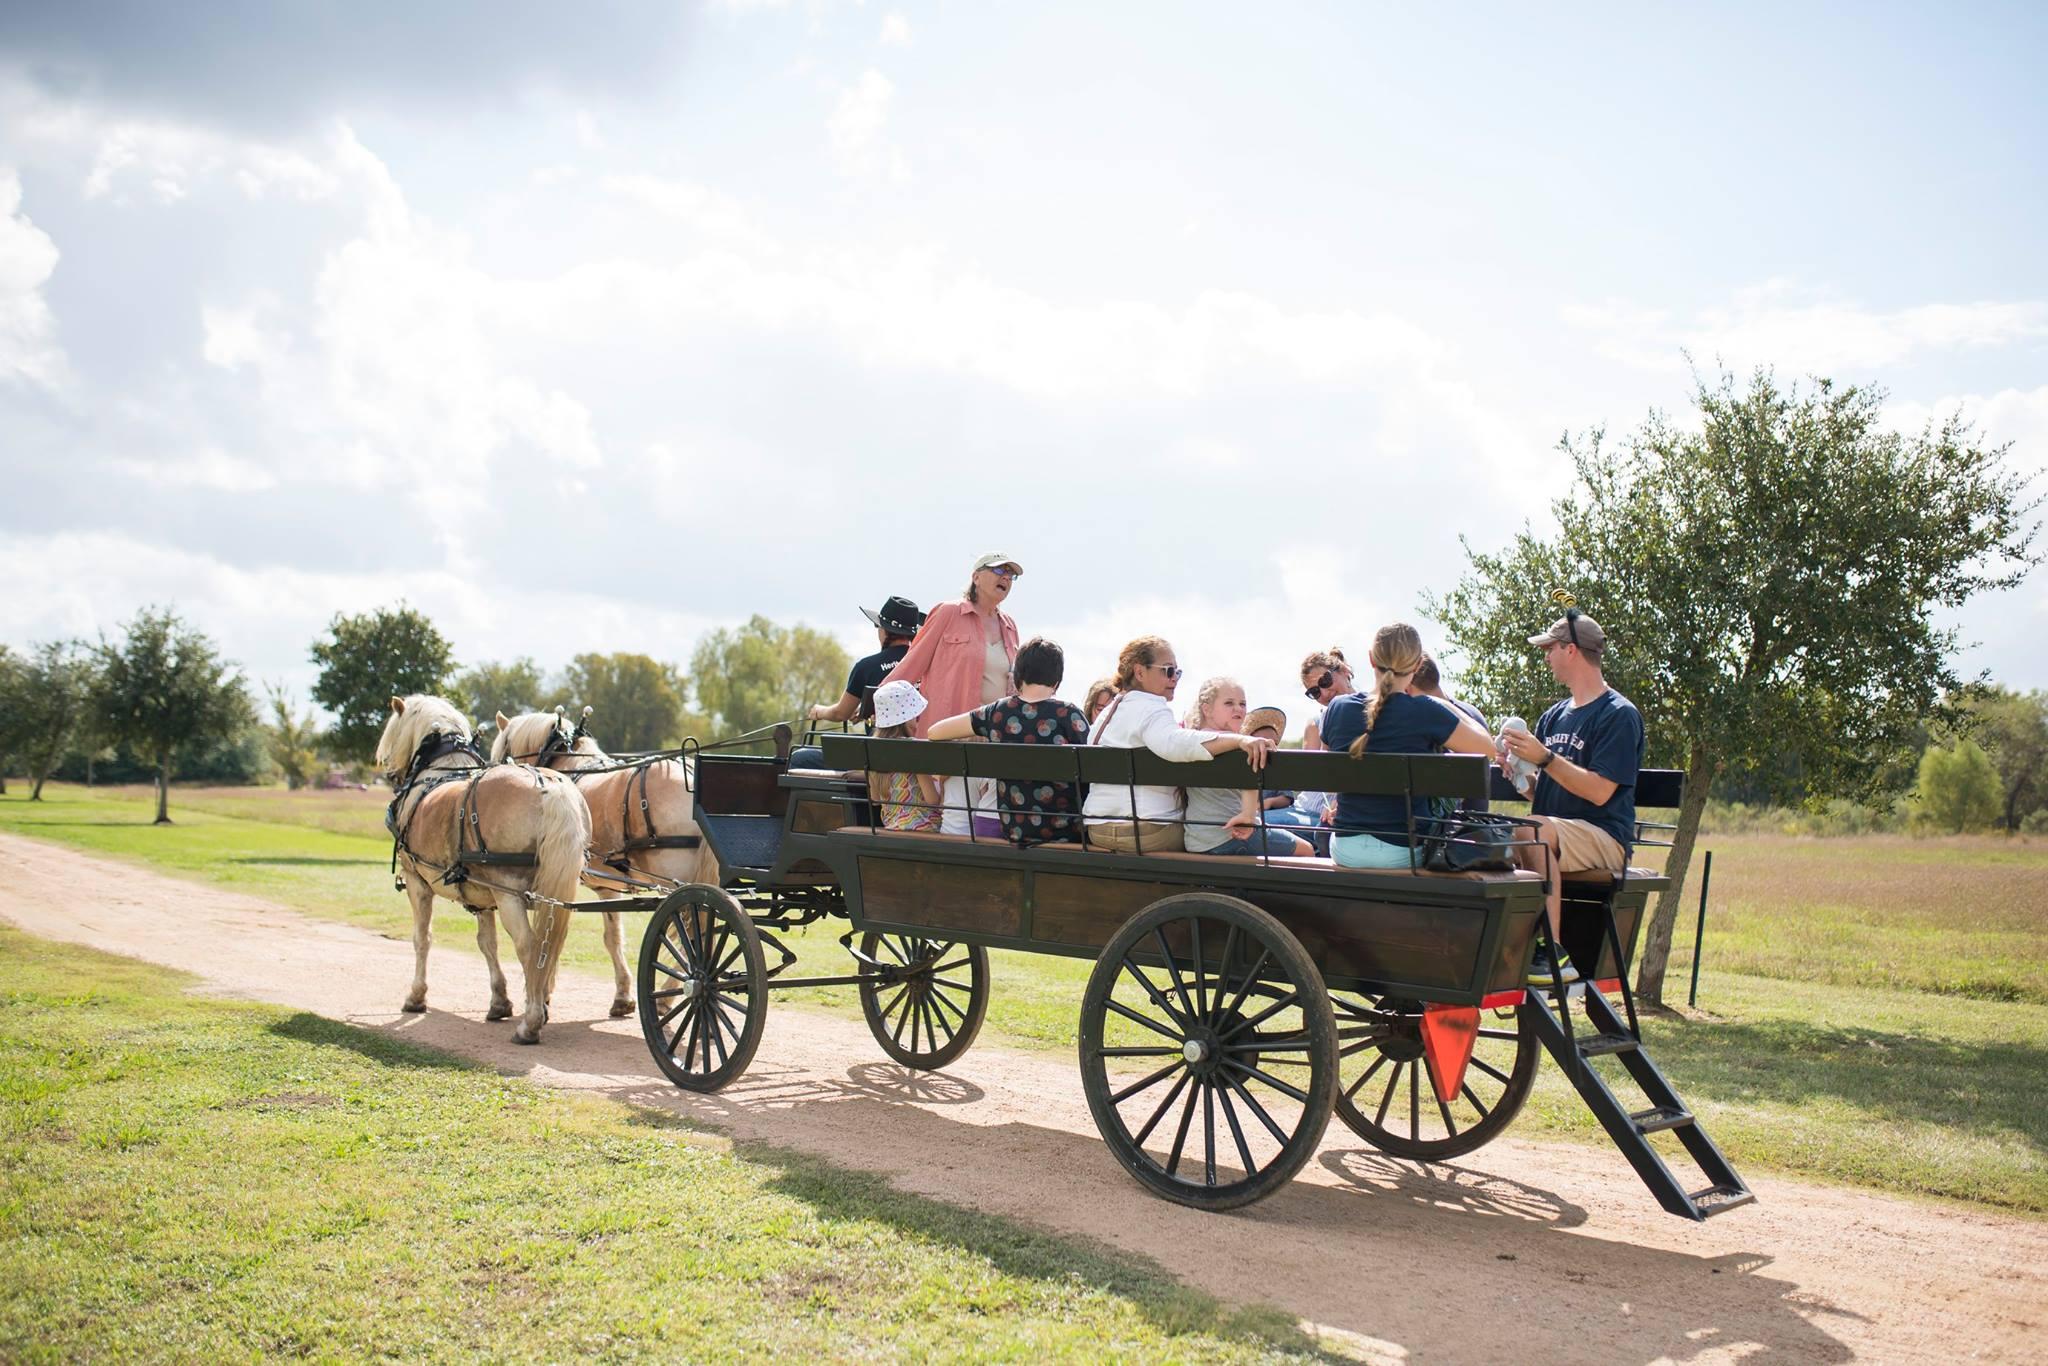 horse-drawn wagon with Nancy Swallow talking-PHF 2017-RKuykendall